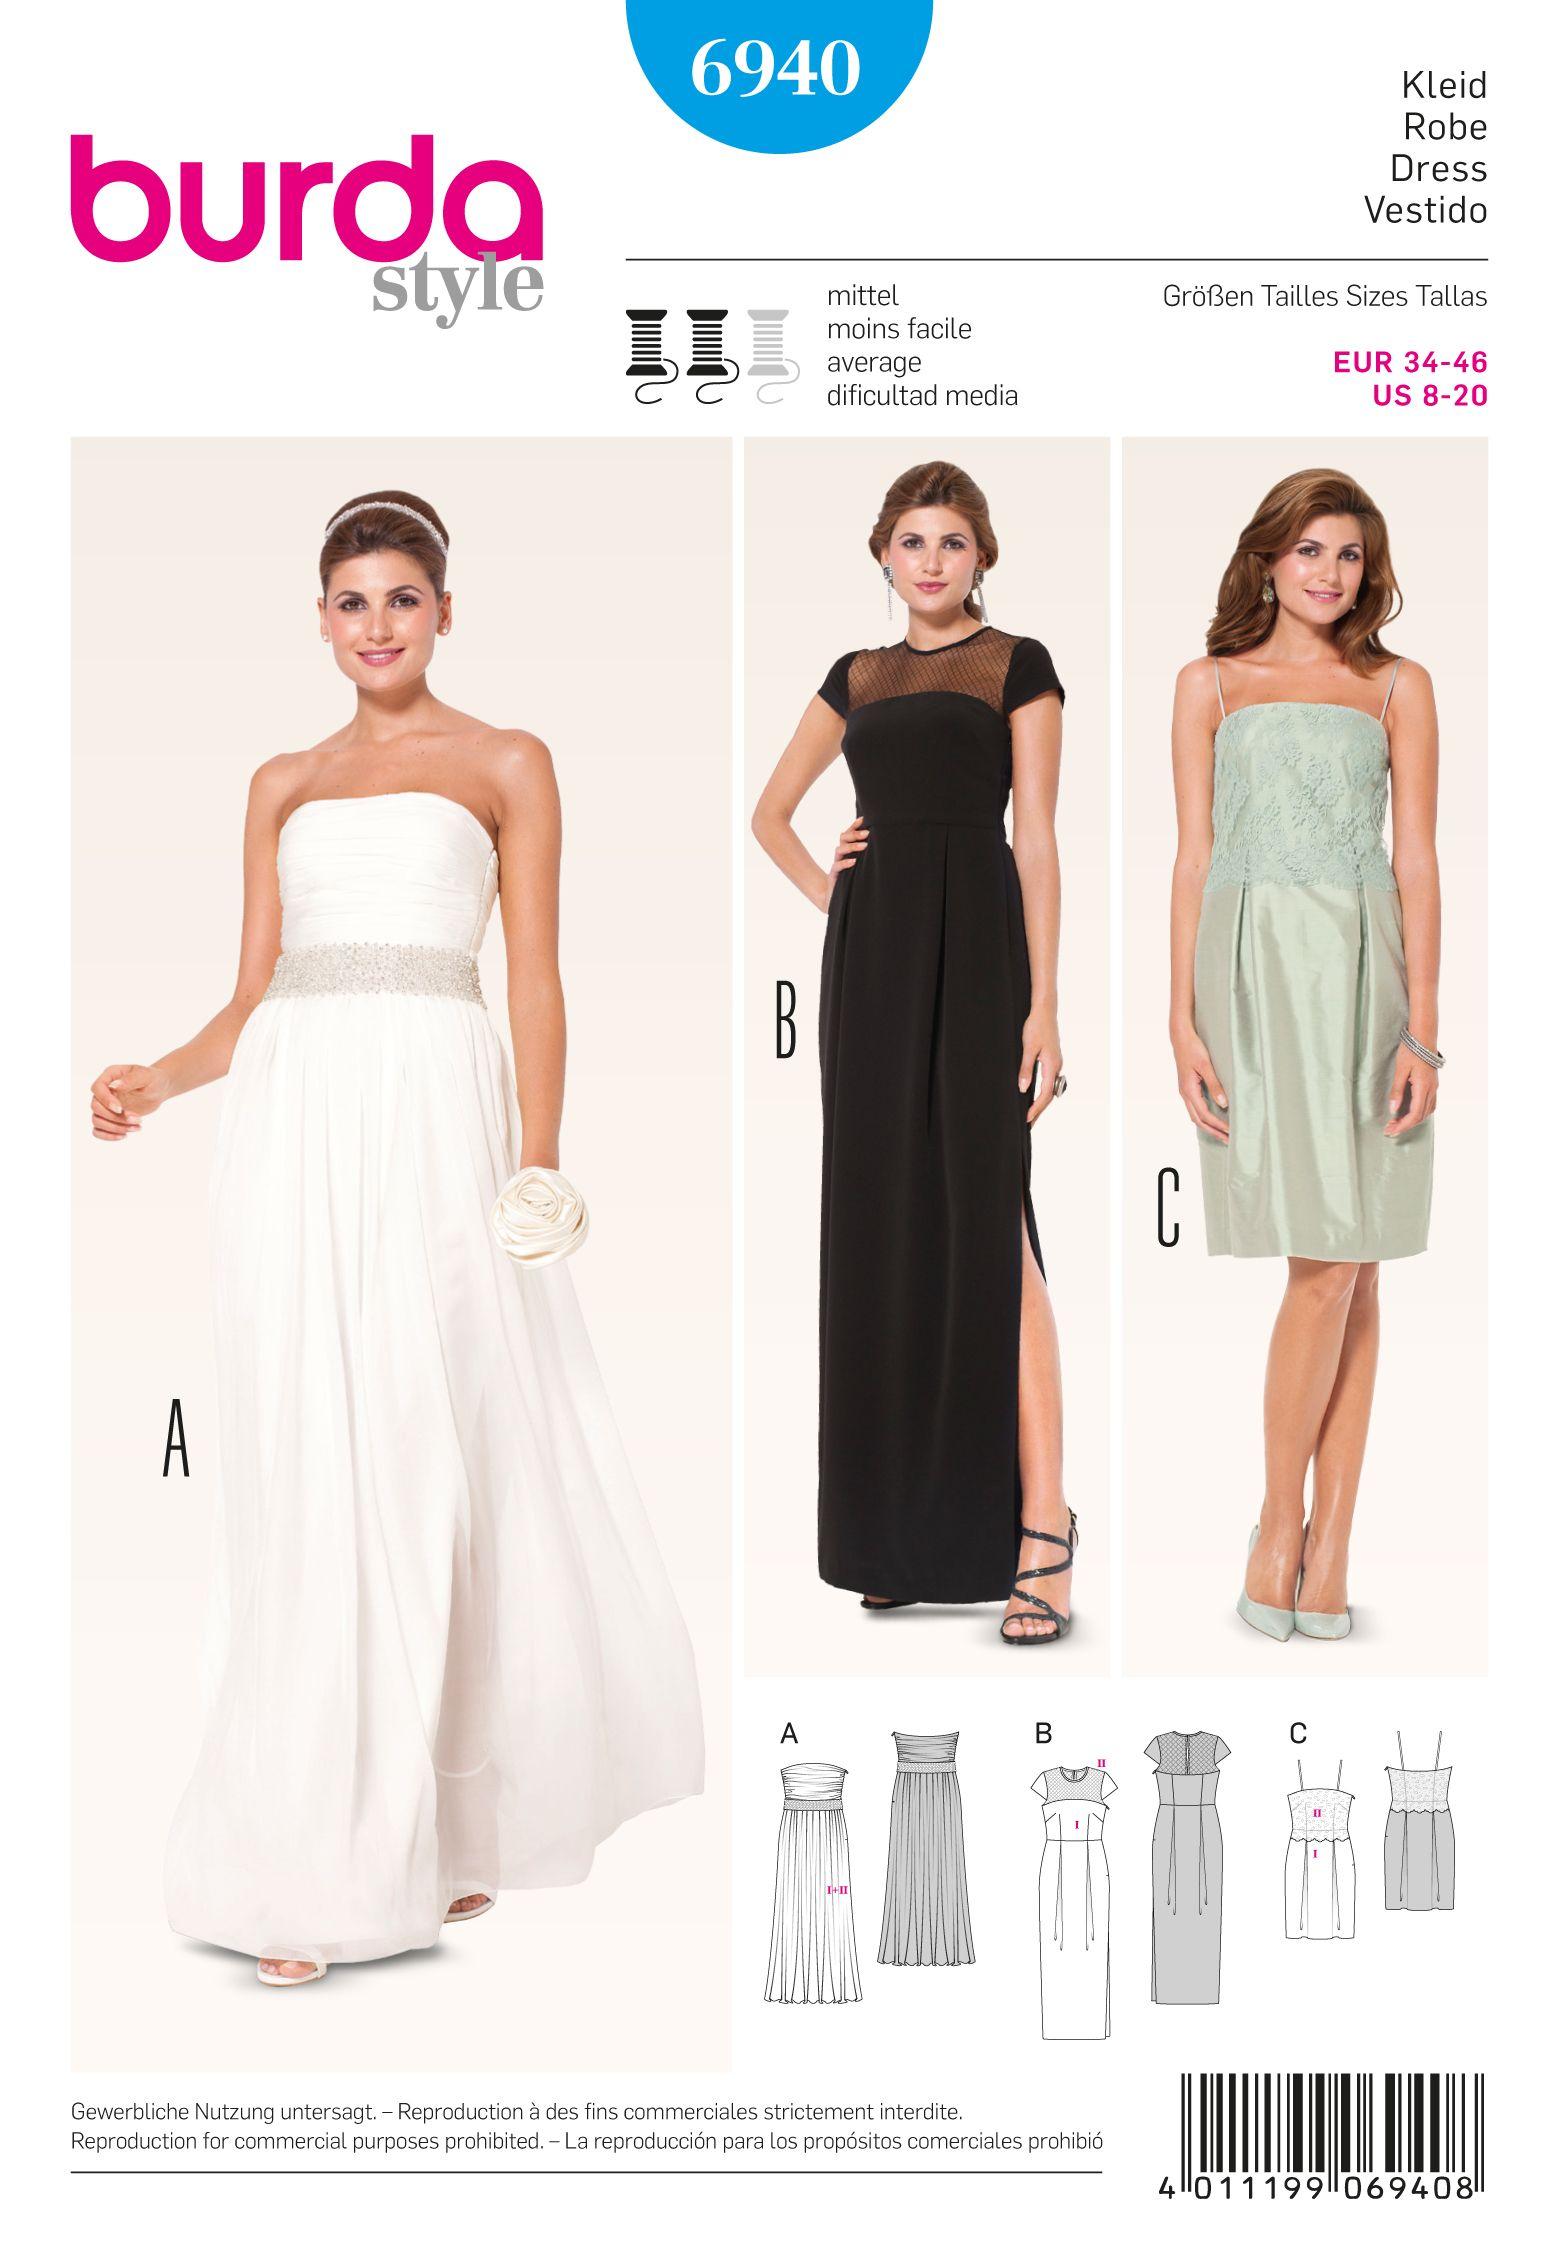 Pin by Kami Latorre on Prom dresses | Pinterest | Burda sewing ...